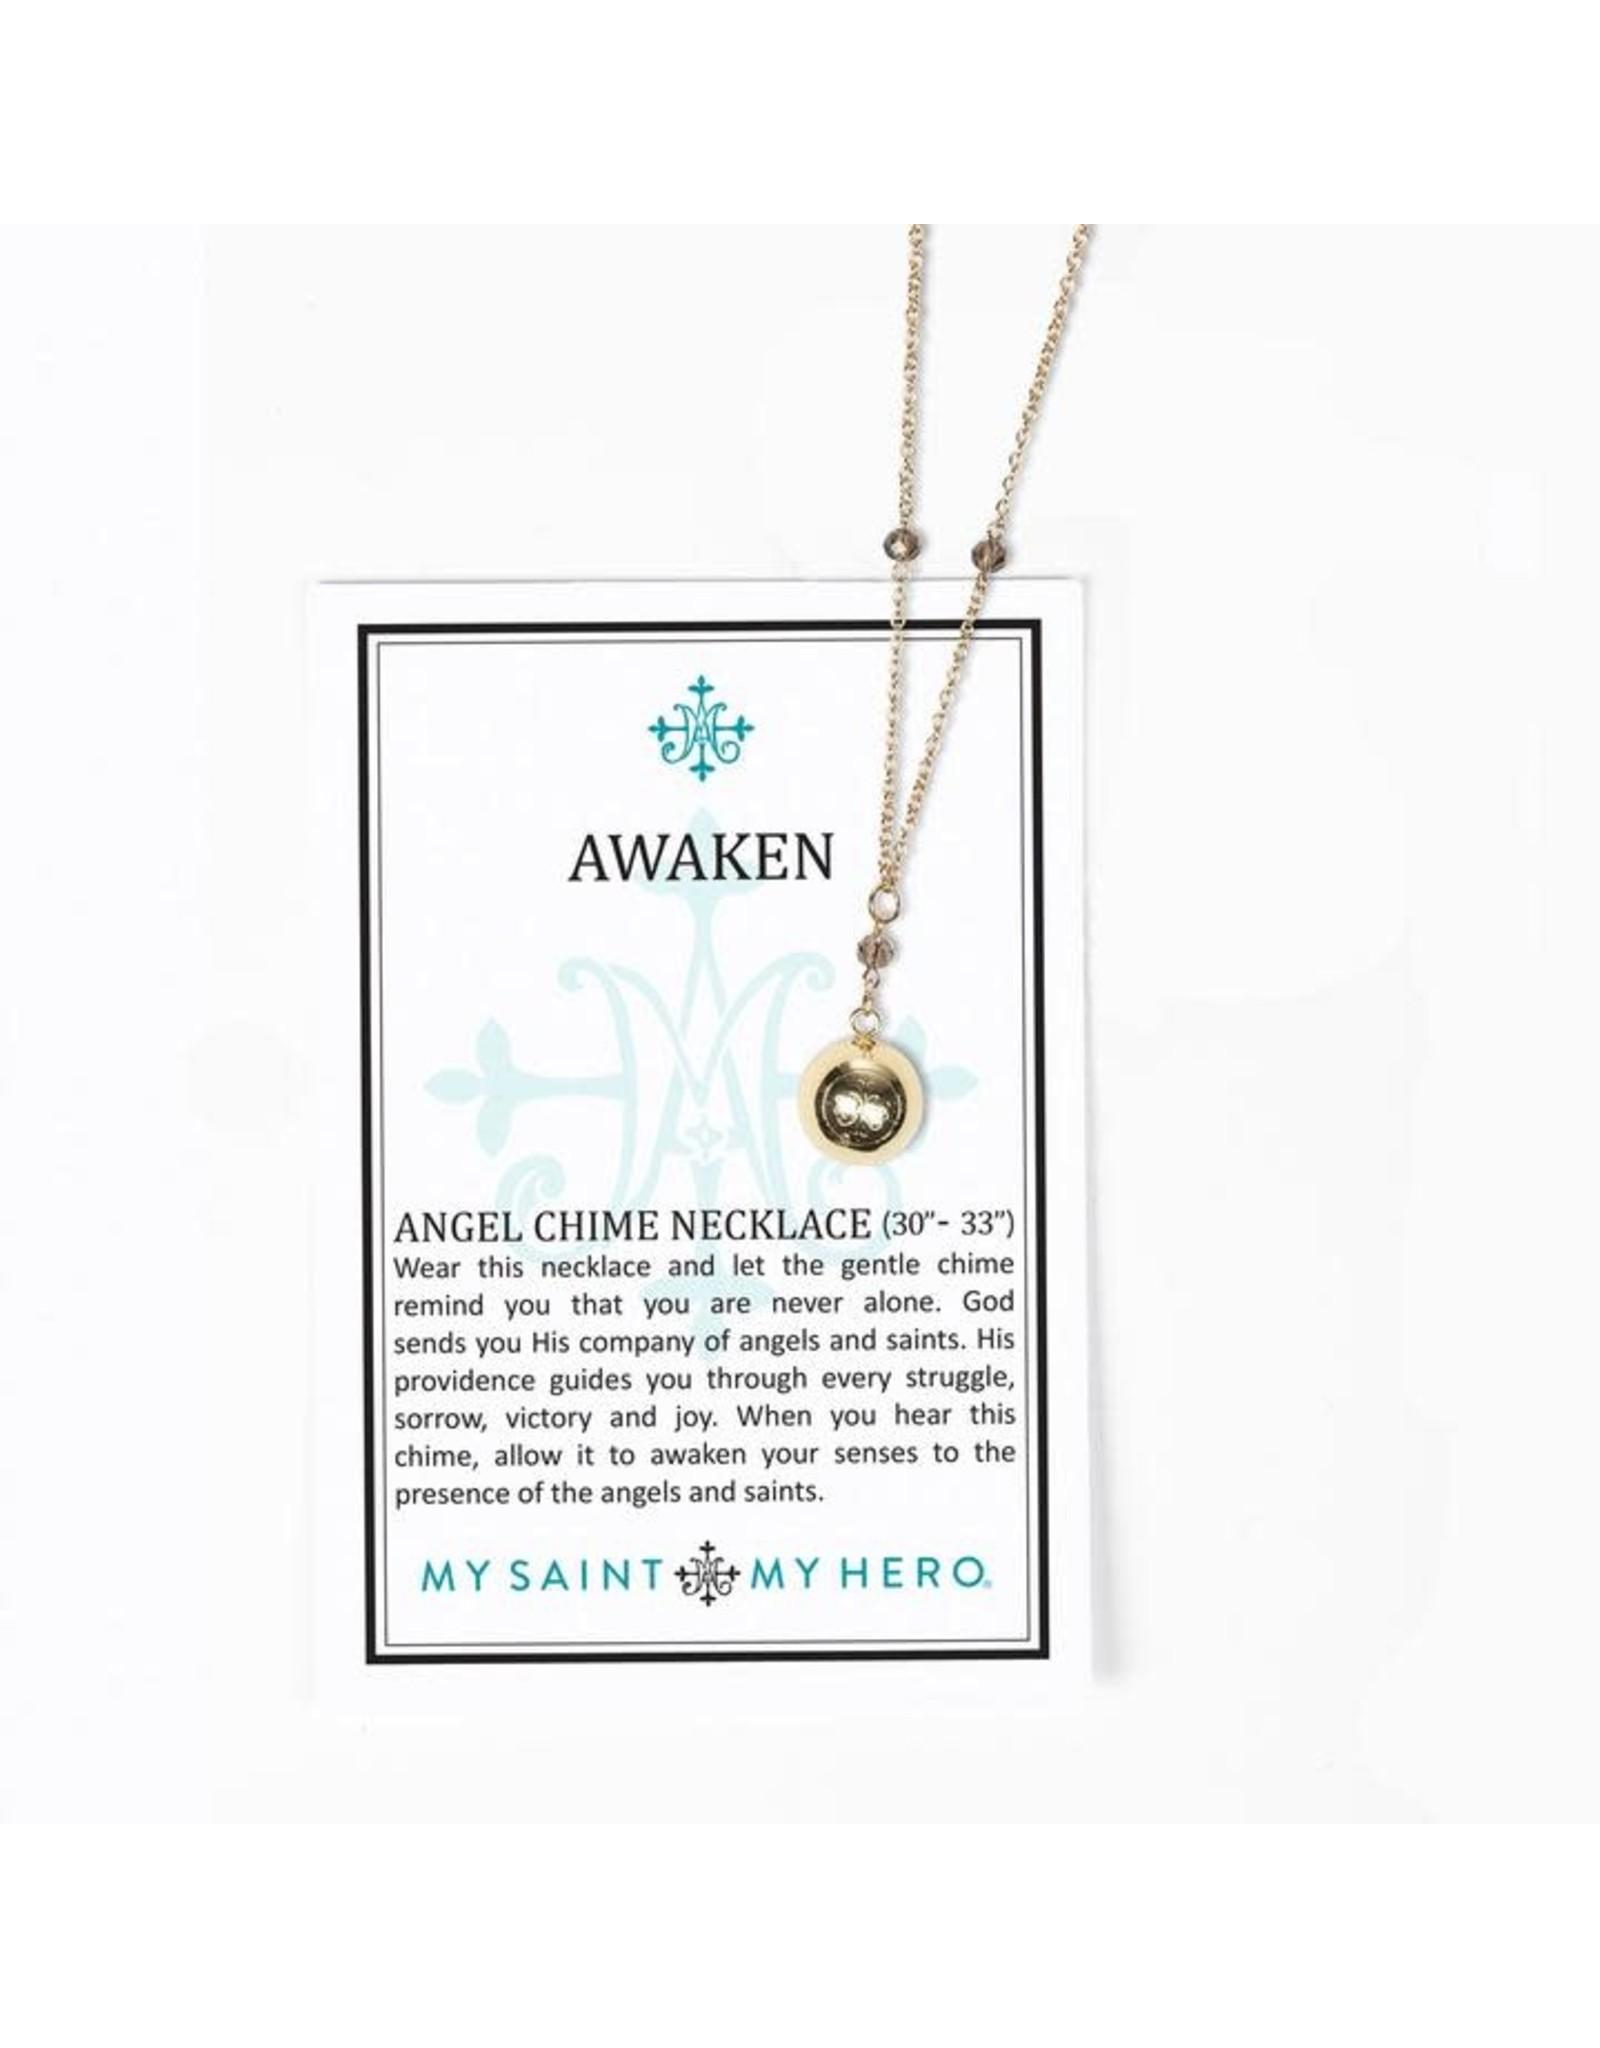 My Saint My Hero Awaken Angel Chime Necklace